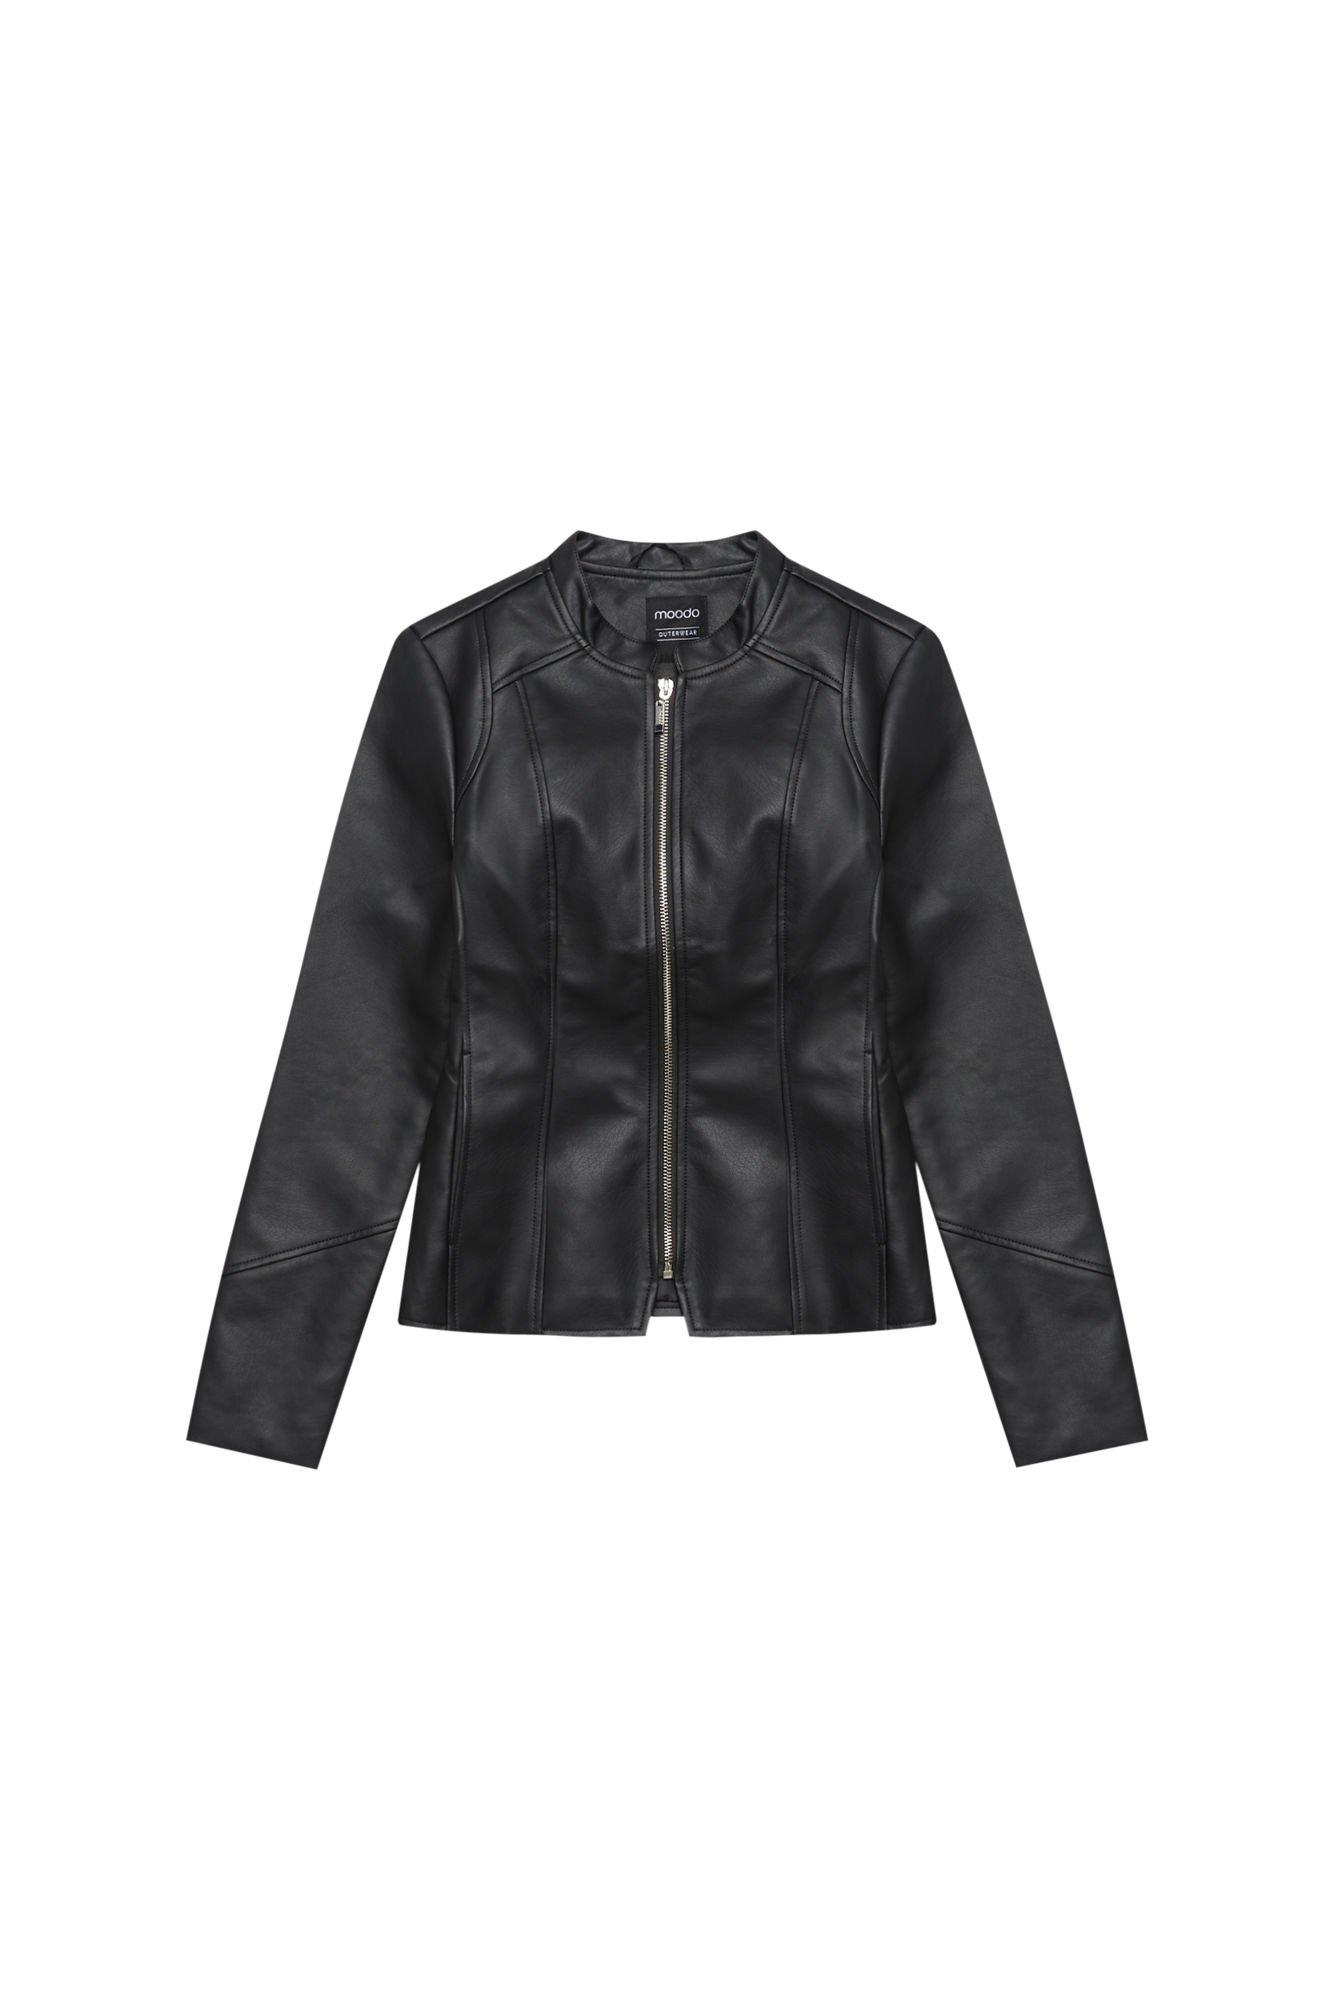 Klasyczna kurtka z eko skóry L KU 2802 BLACK | Moodo